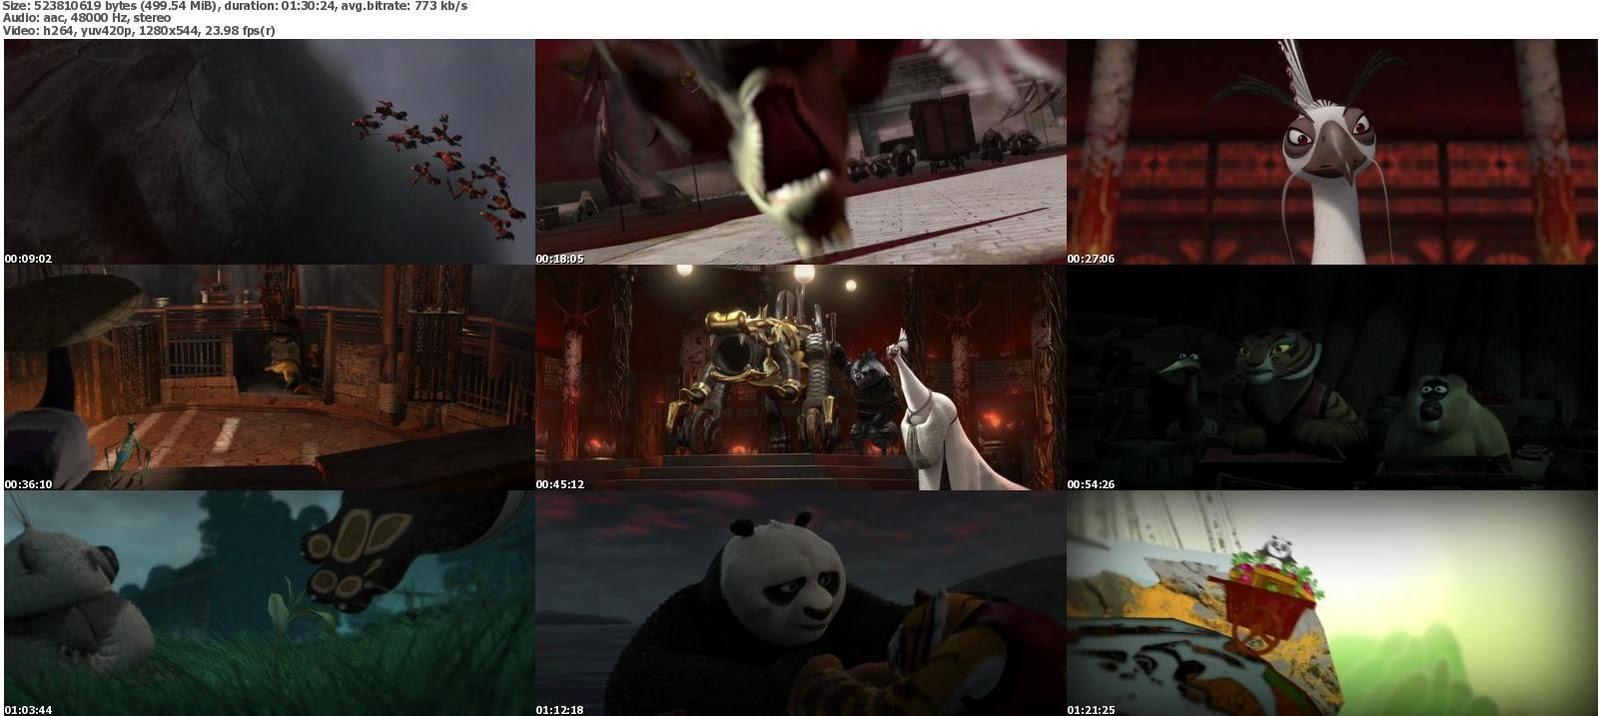 Kung Fu Panda 3 (English) Man Full Movie Download In Hindi Dubbed Hd Kung+Fu+Panda+2+%25282011%2529+BluRay+720p+BRRip+500MB+Mediafirehbo.com